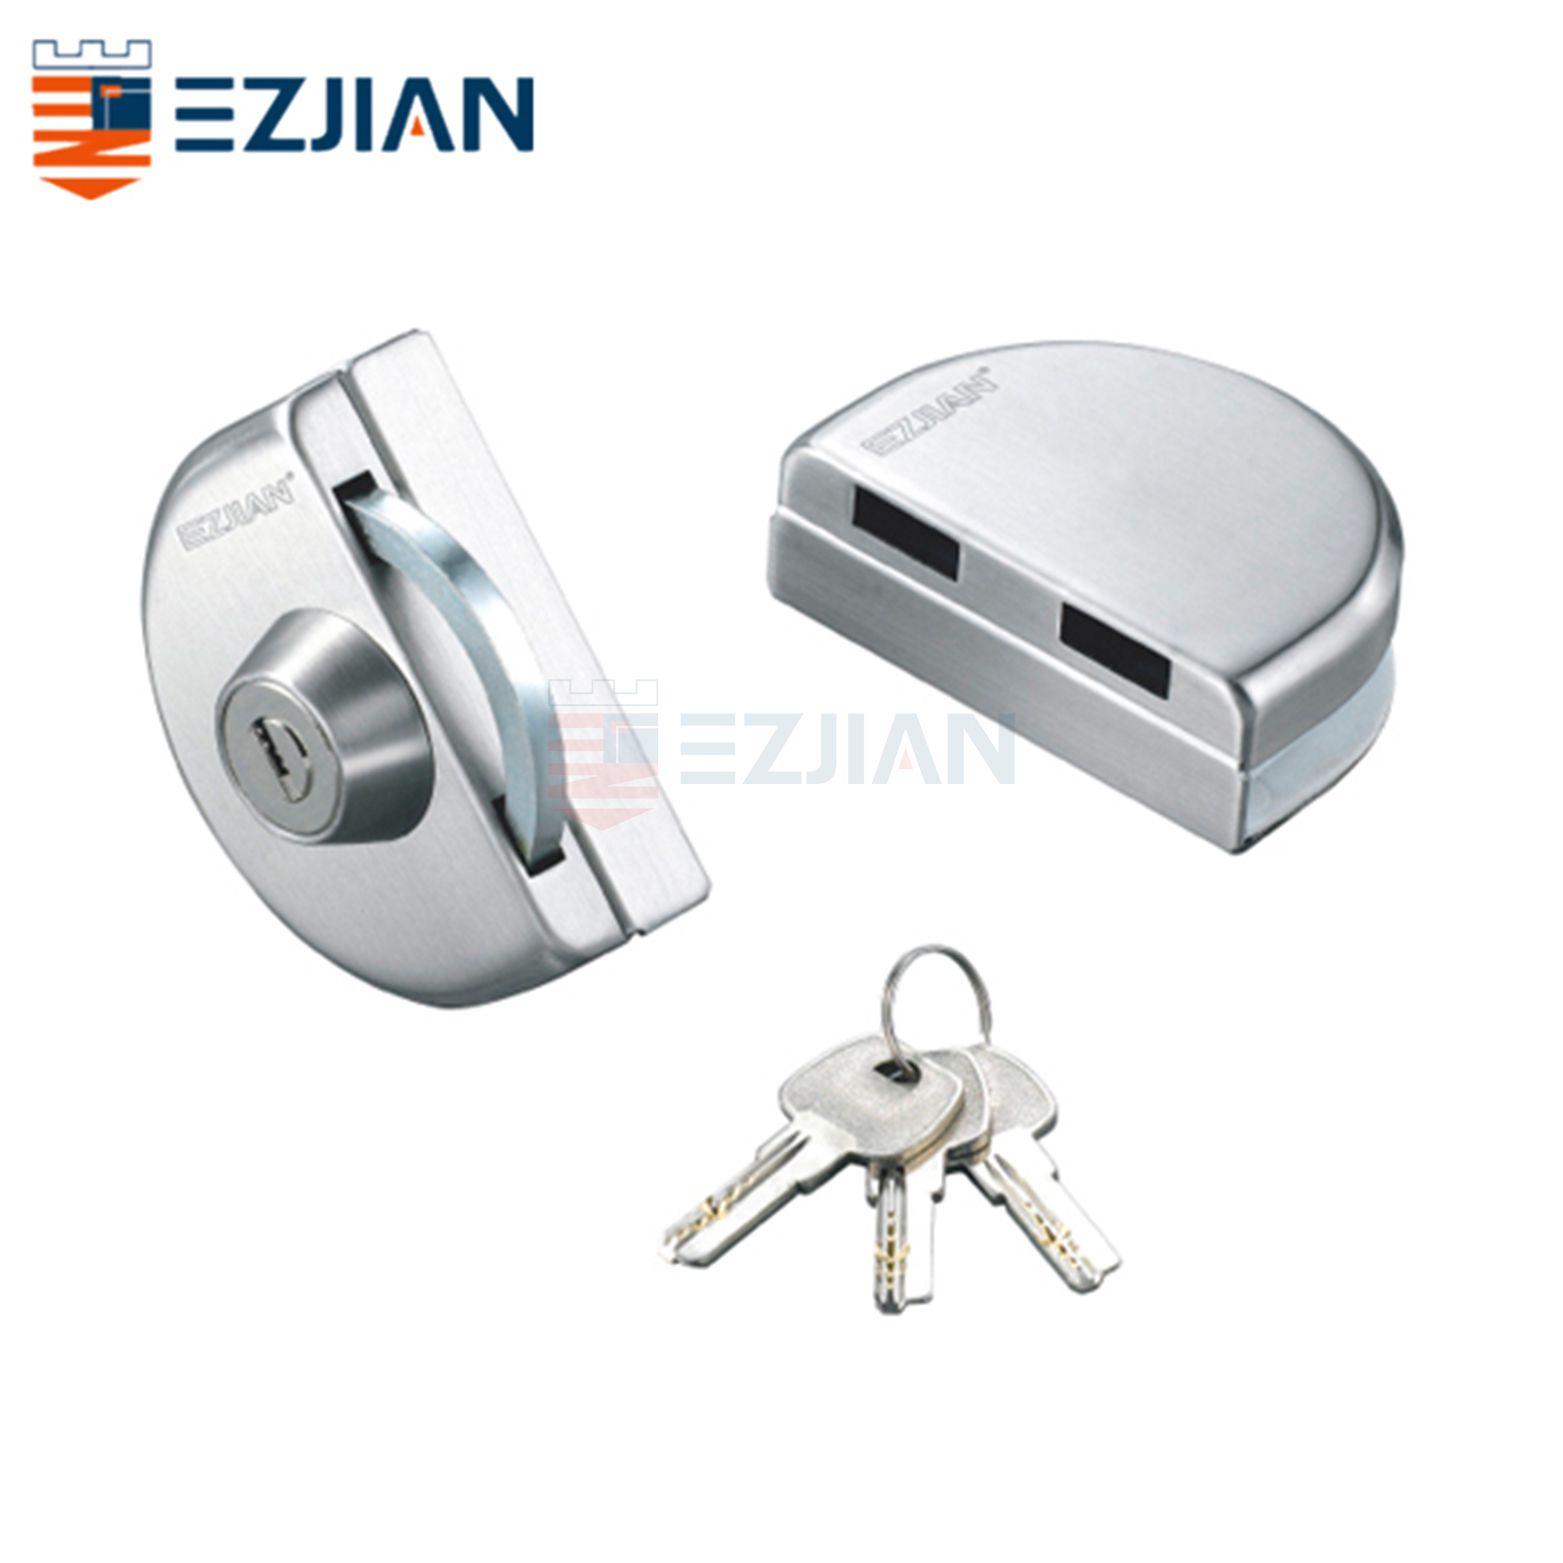 Glass Gate Lock EJ-9010